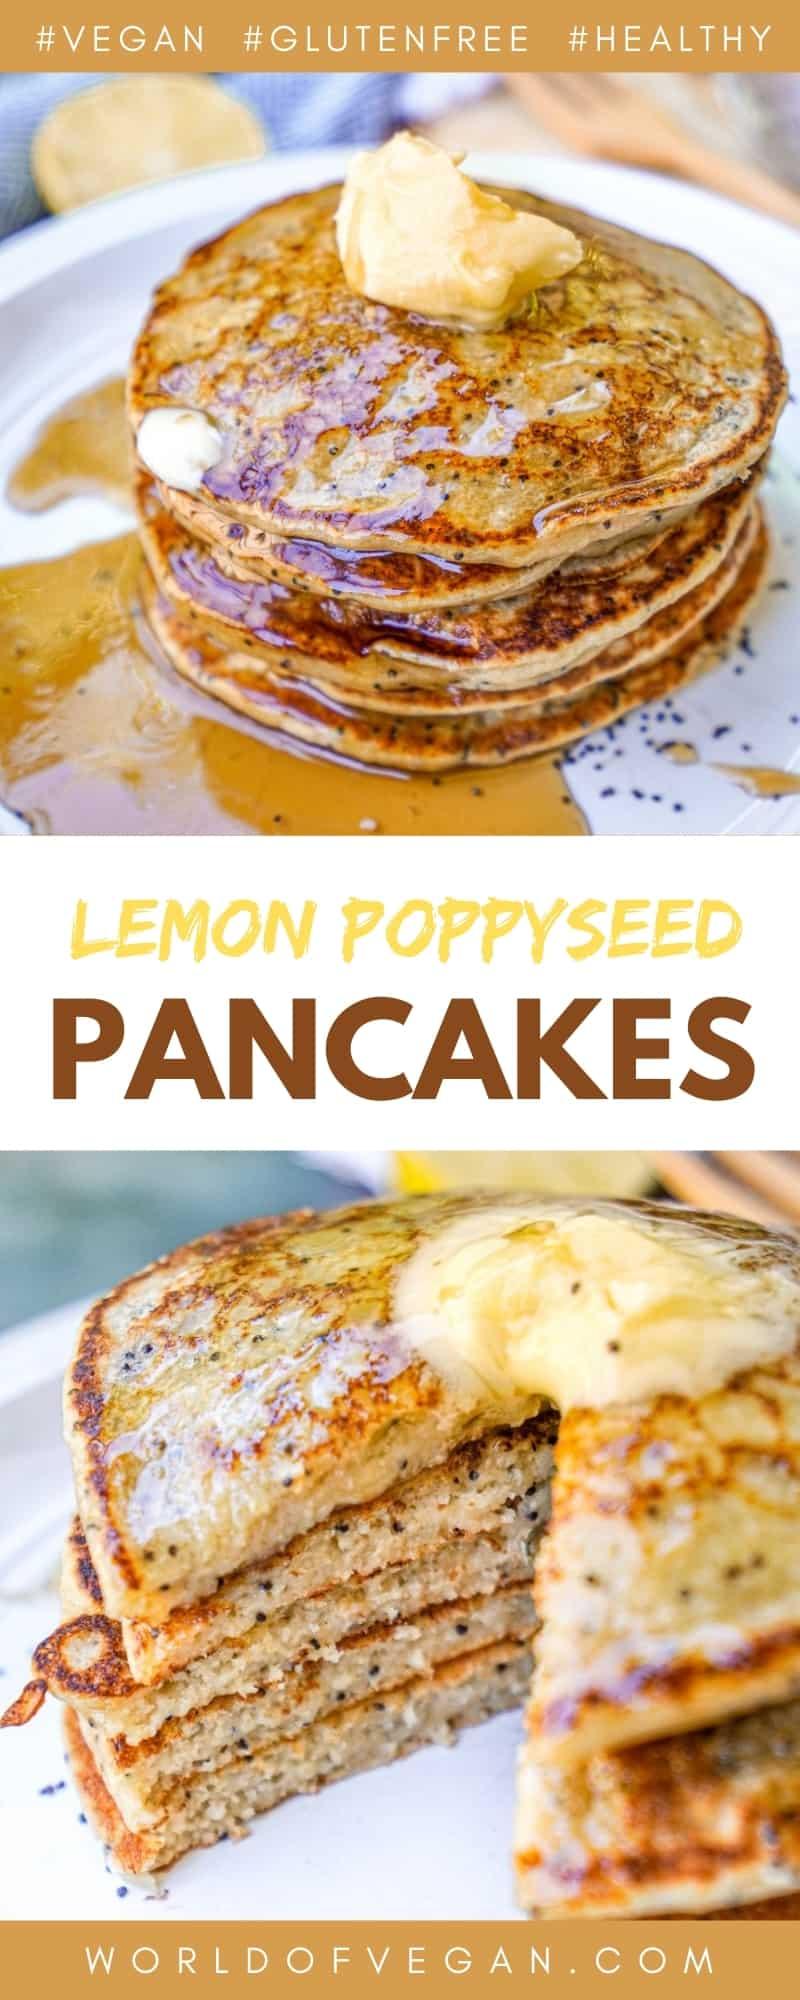 Vegan Lemon Poppyseed Pancakes Pinterest Graphic